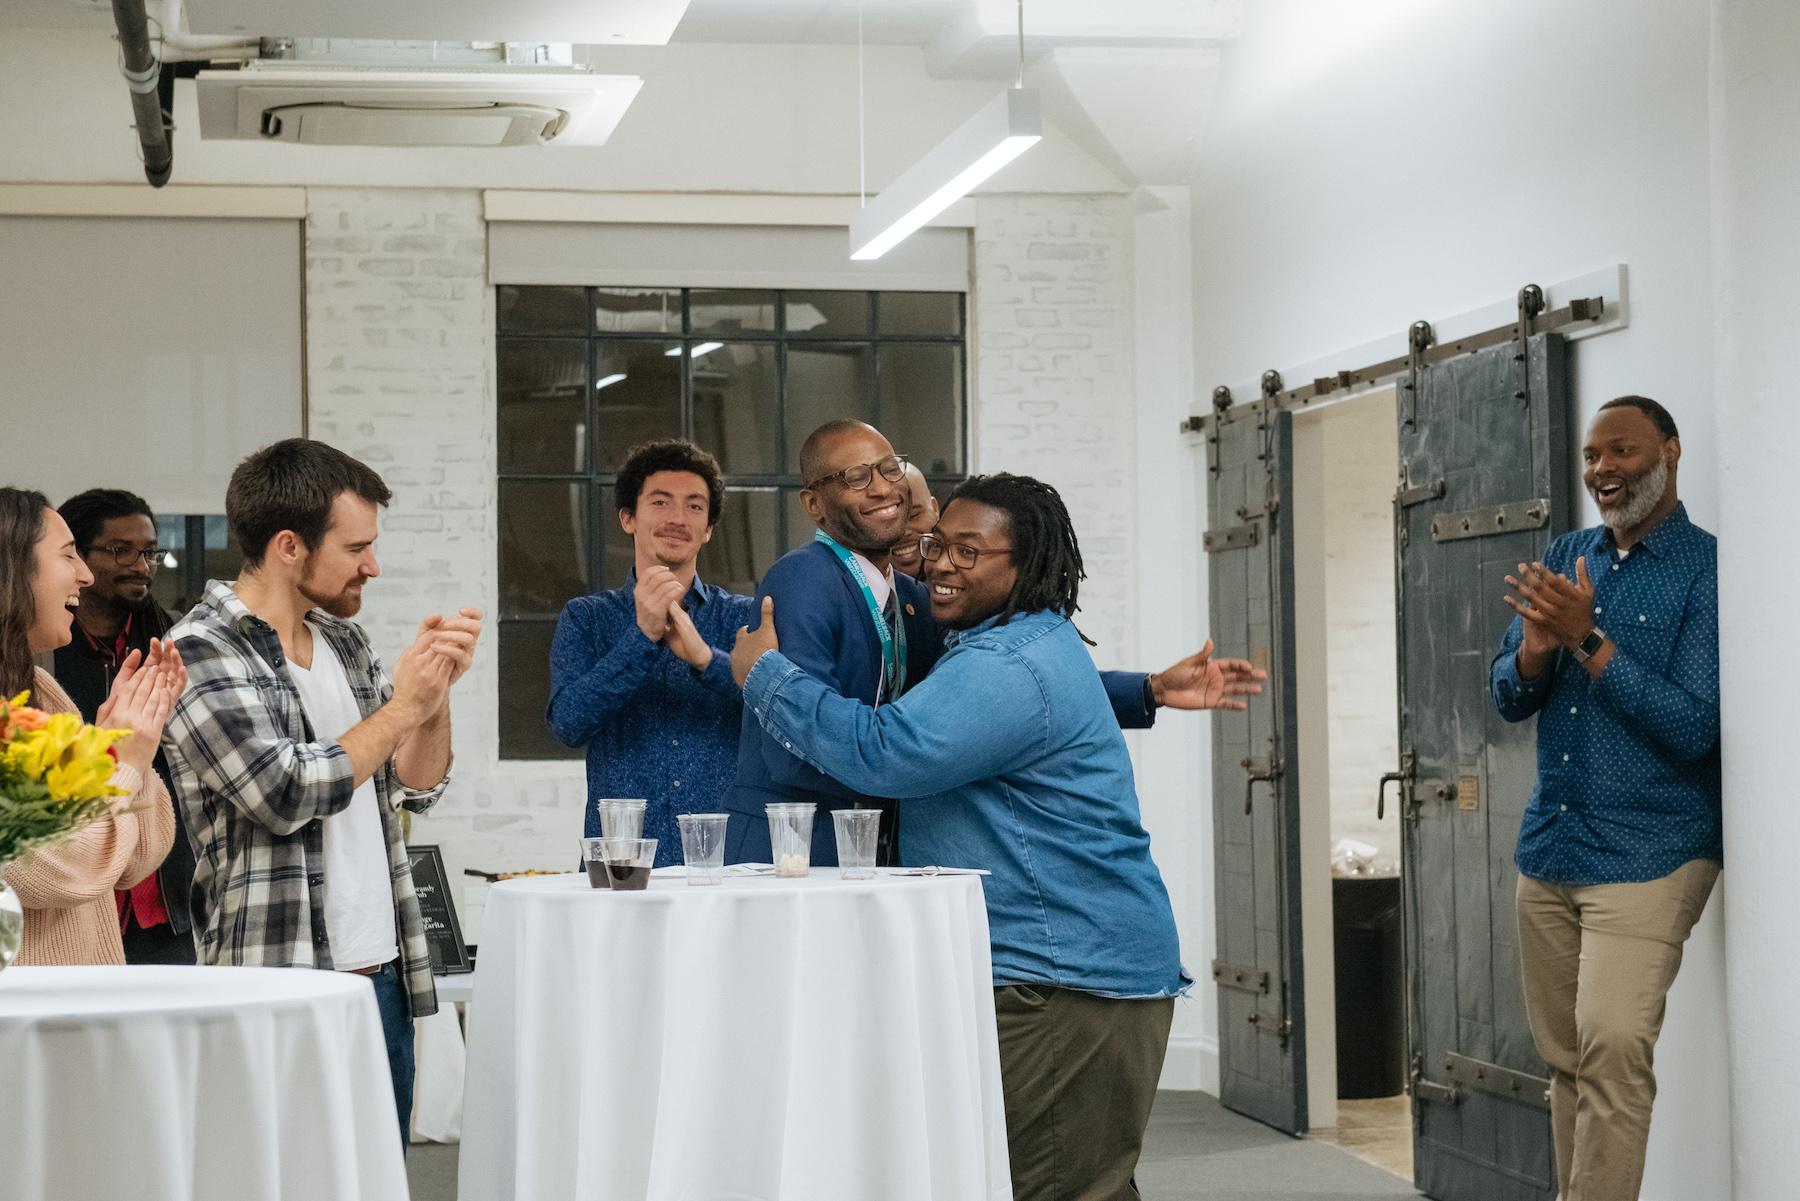 Gigsy; 2019-01-25; Camelback Ventures - Award Presentation; 113.jpg